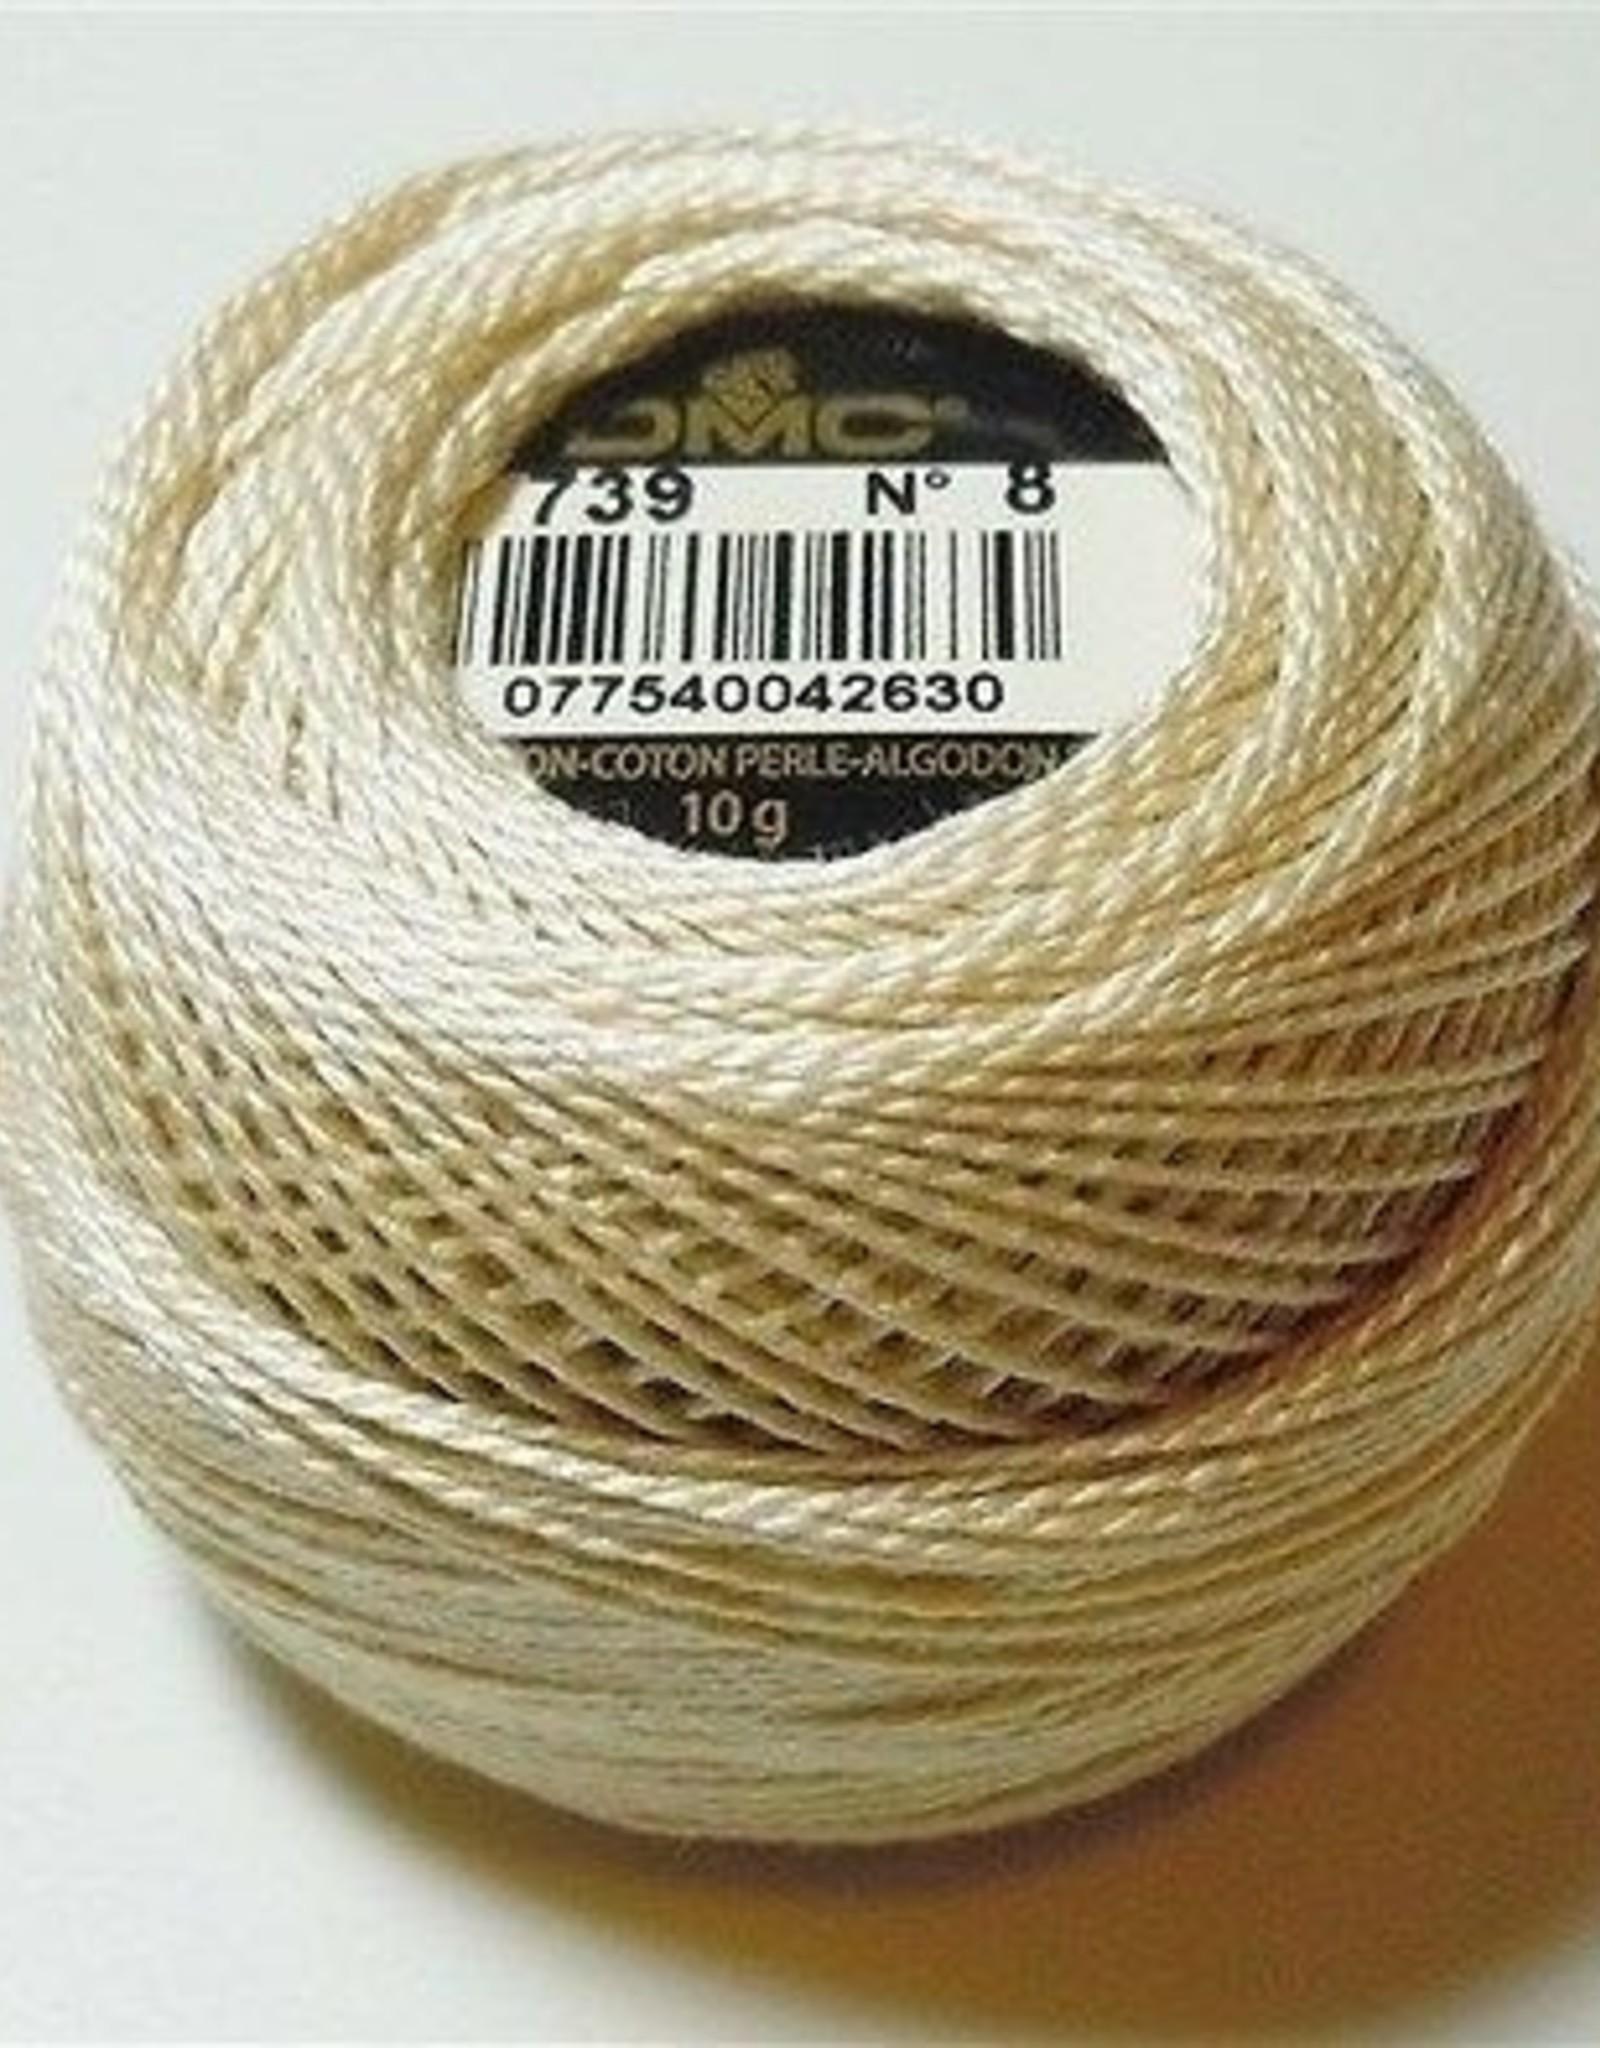 DMC Pearl Cotton Balls Size 8 - 87 Yards, Very Light Mocha Brown